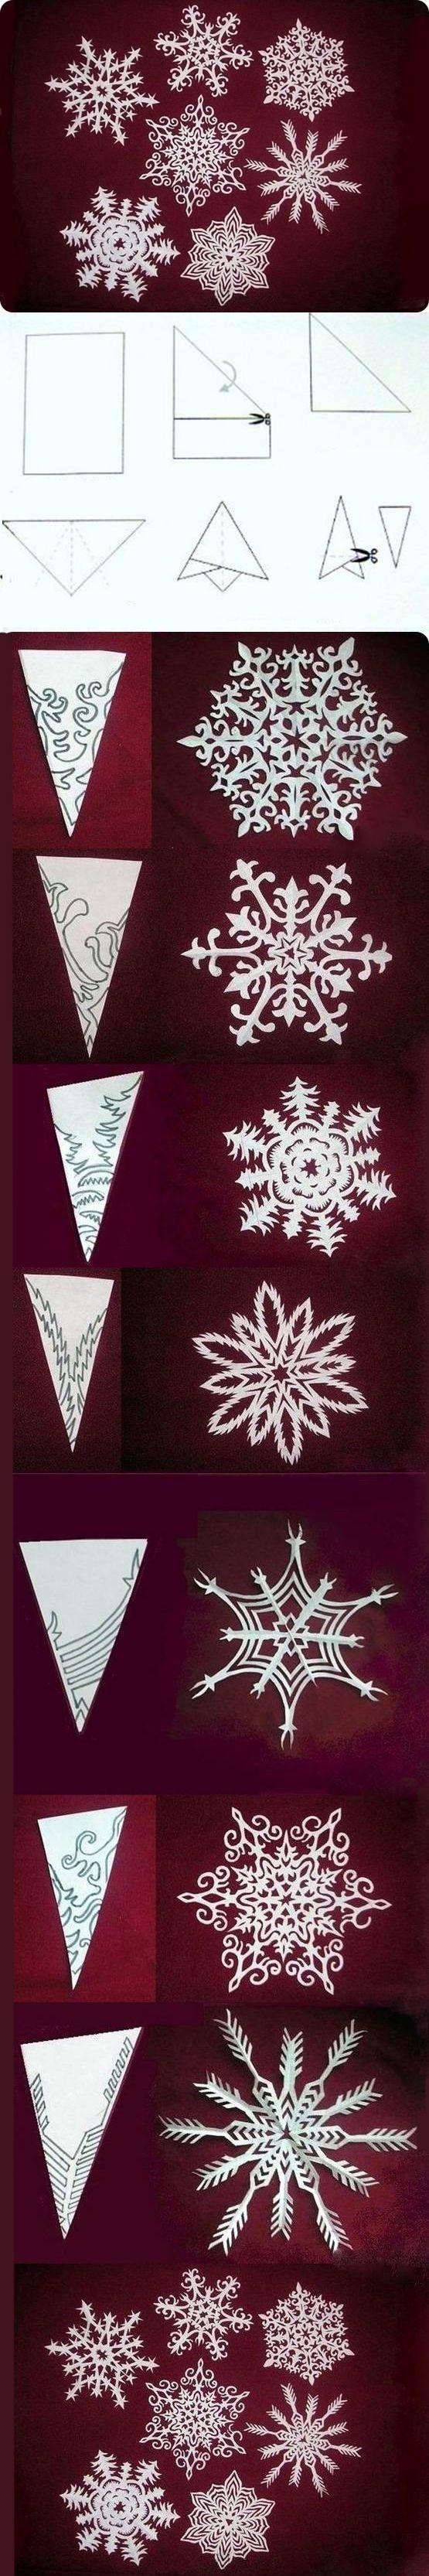 Paper snowflake patterns paper snowflake paper snowflake for Diy snowflakes paper pattern